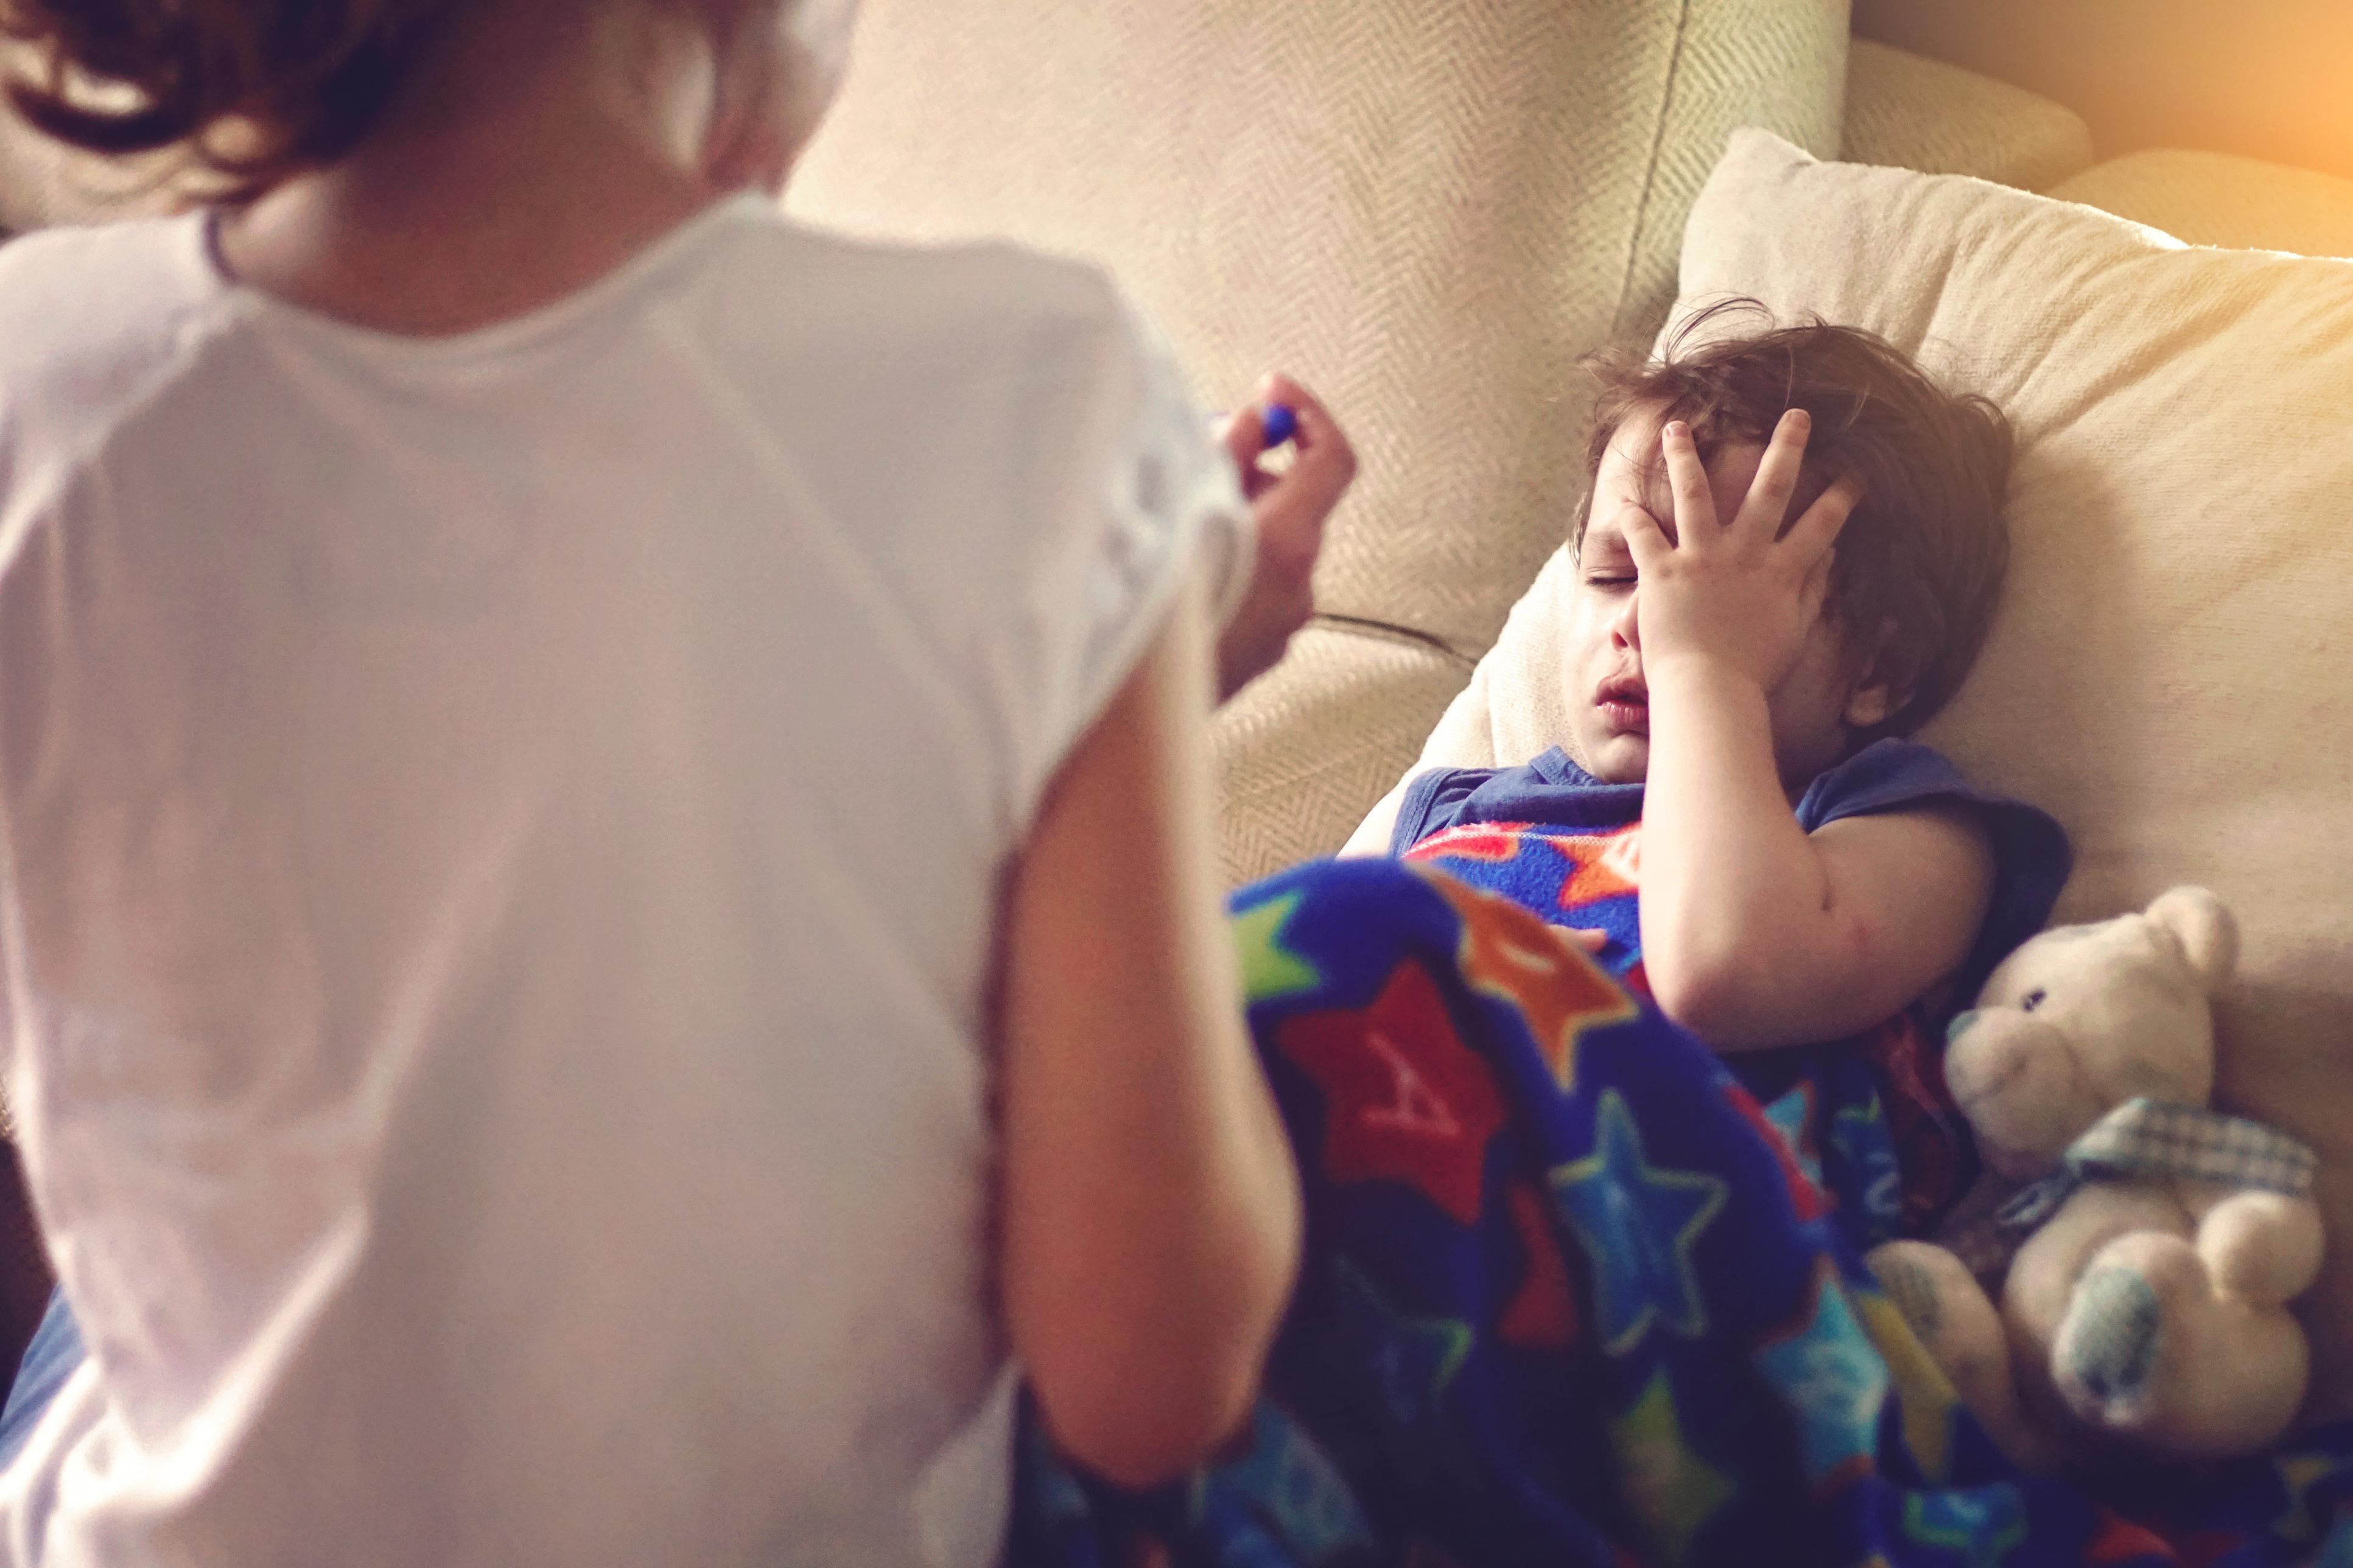 Pneumoniae sintomas klebsiella